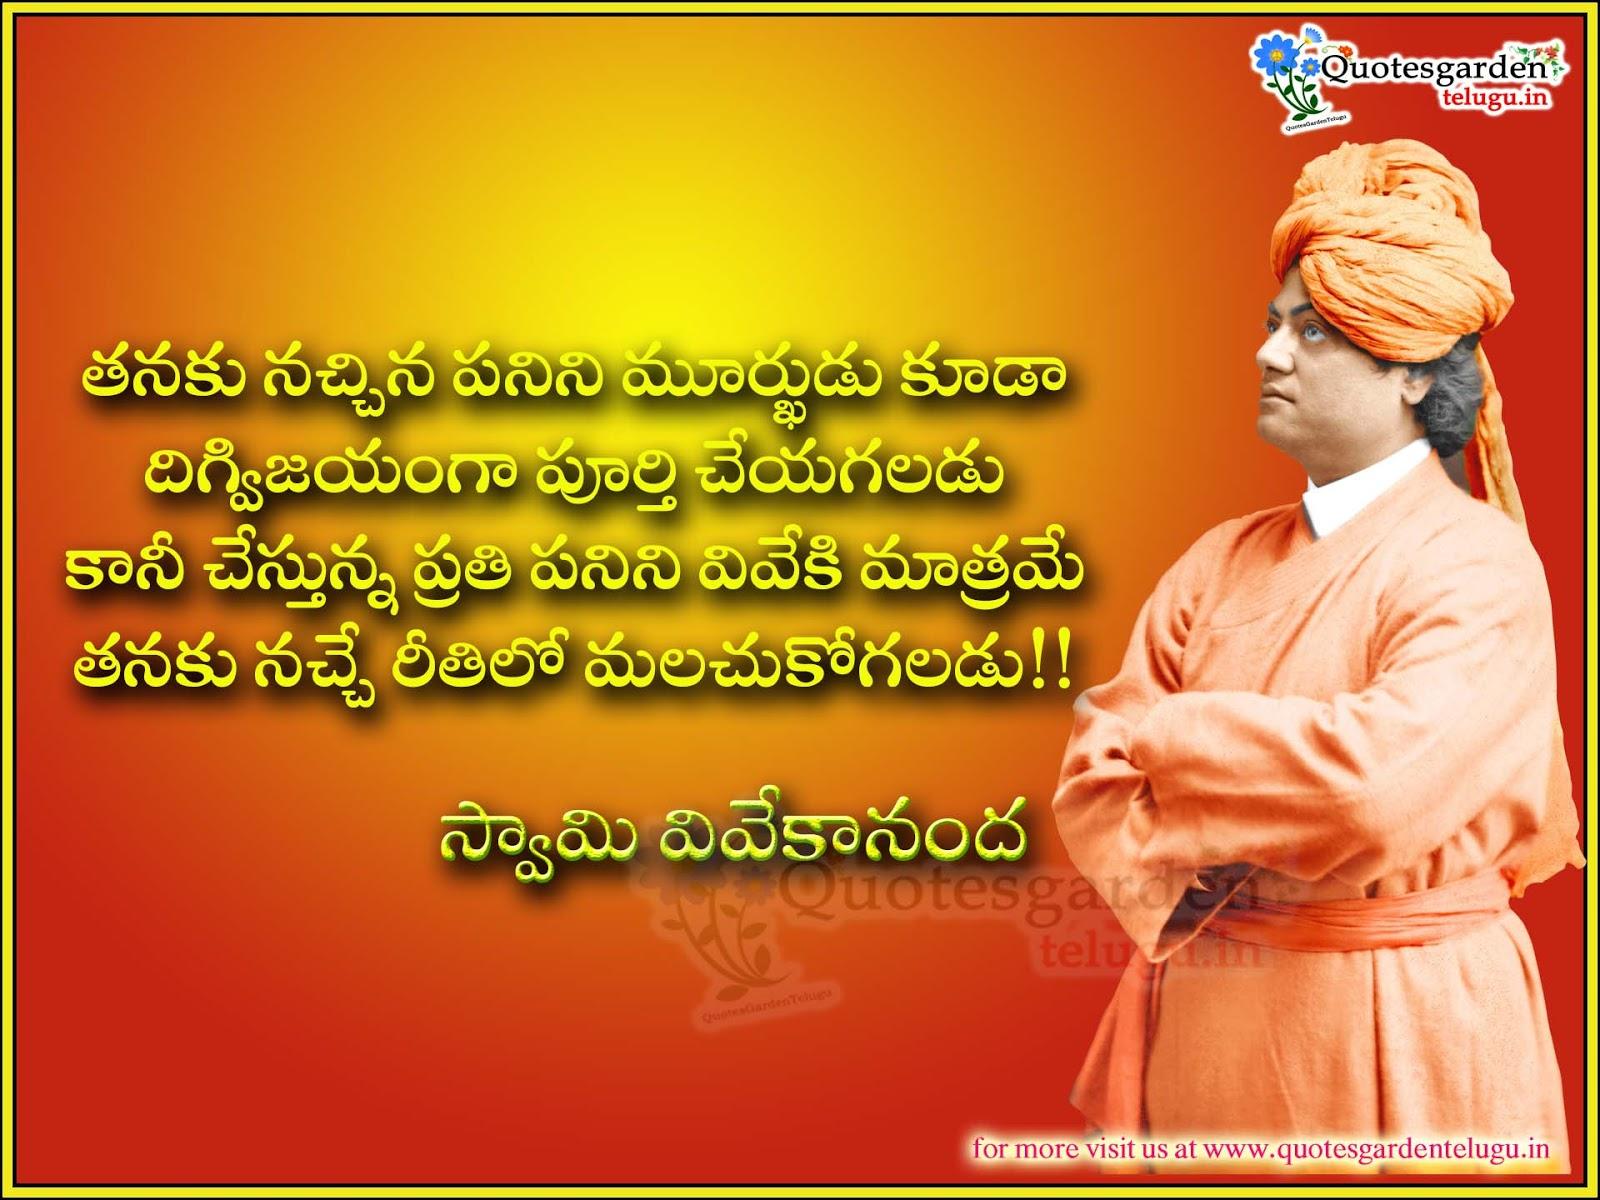 Swamy Vivekananda Telugu quotes messages | QUOTES GARDEN ...